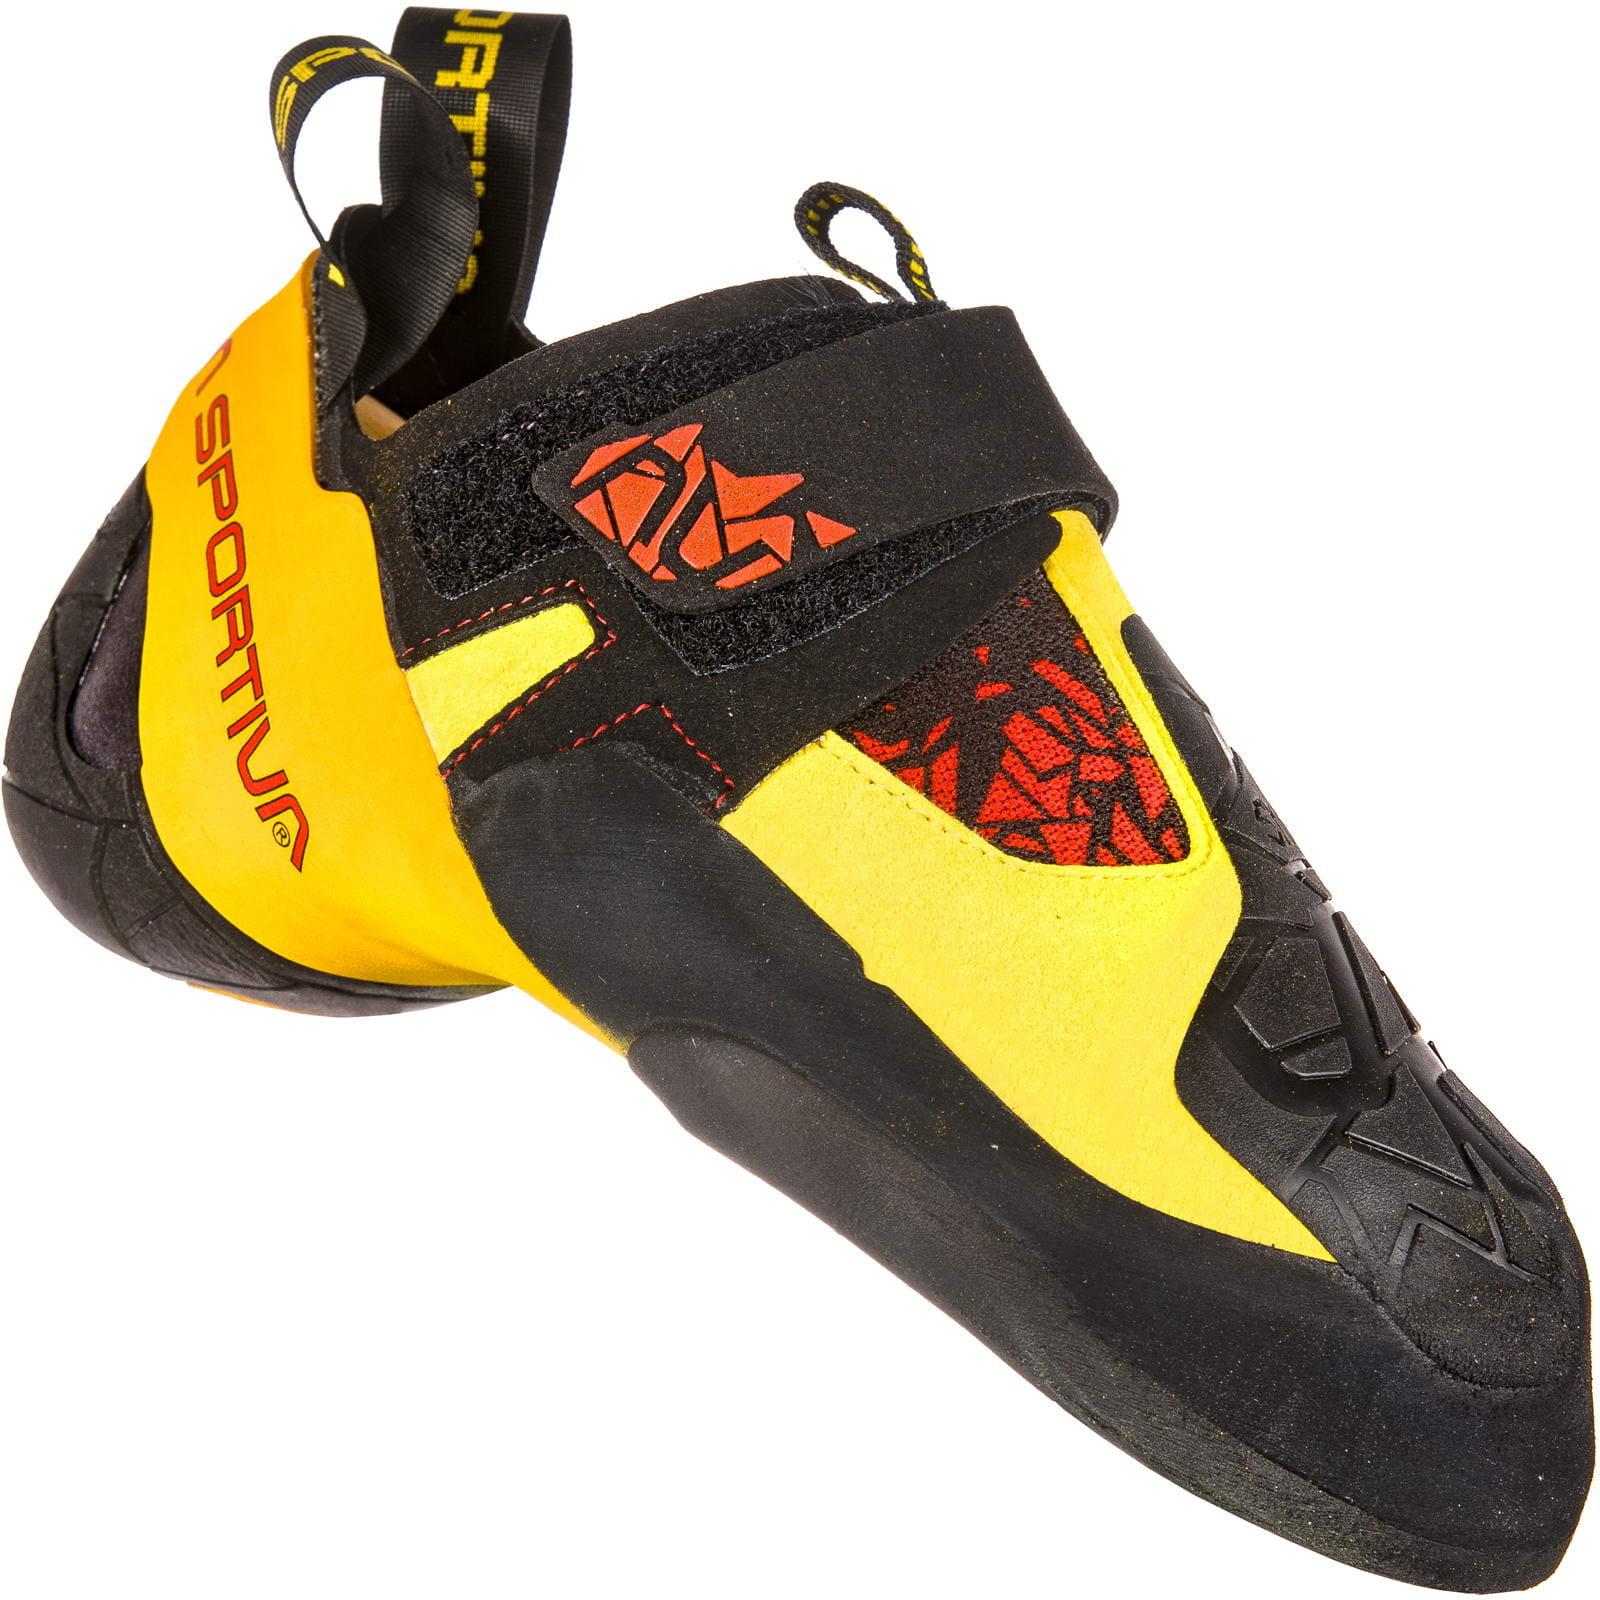 La Sportiva Skwama - Kletterschuhe black-yellow - Bild 1